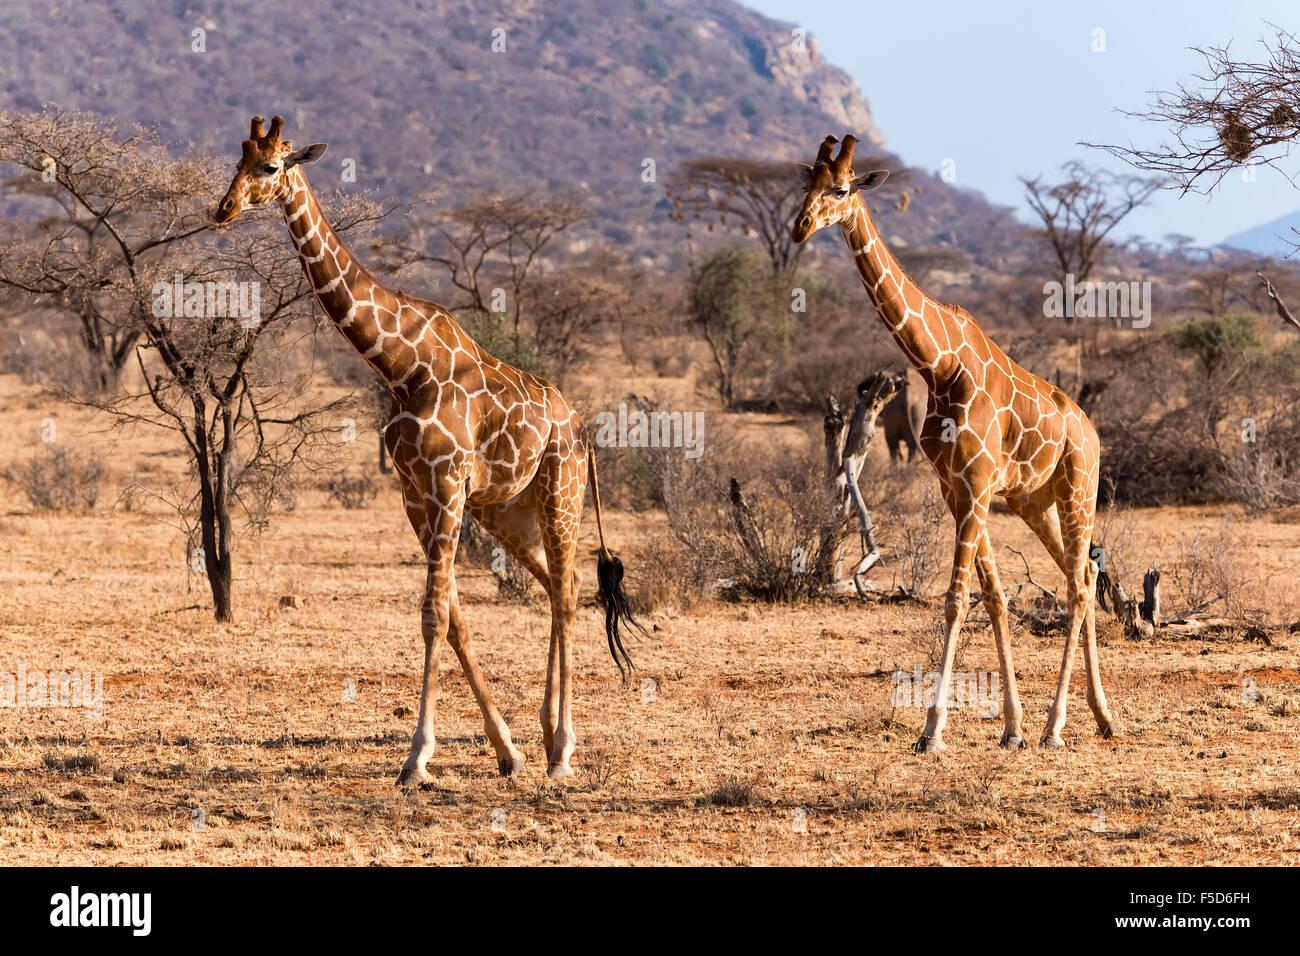 Jirafas reticulado o jirafas somalí (Giraffa camelopardalis reticulata) en marcha, Reserva Nacional de Samburu, Kenia Foto de stock